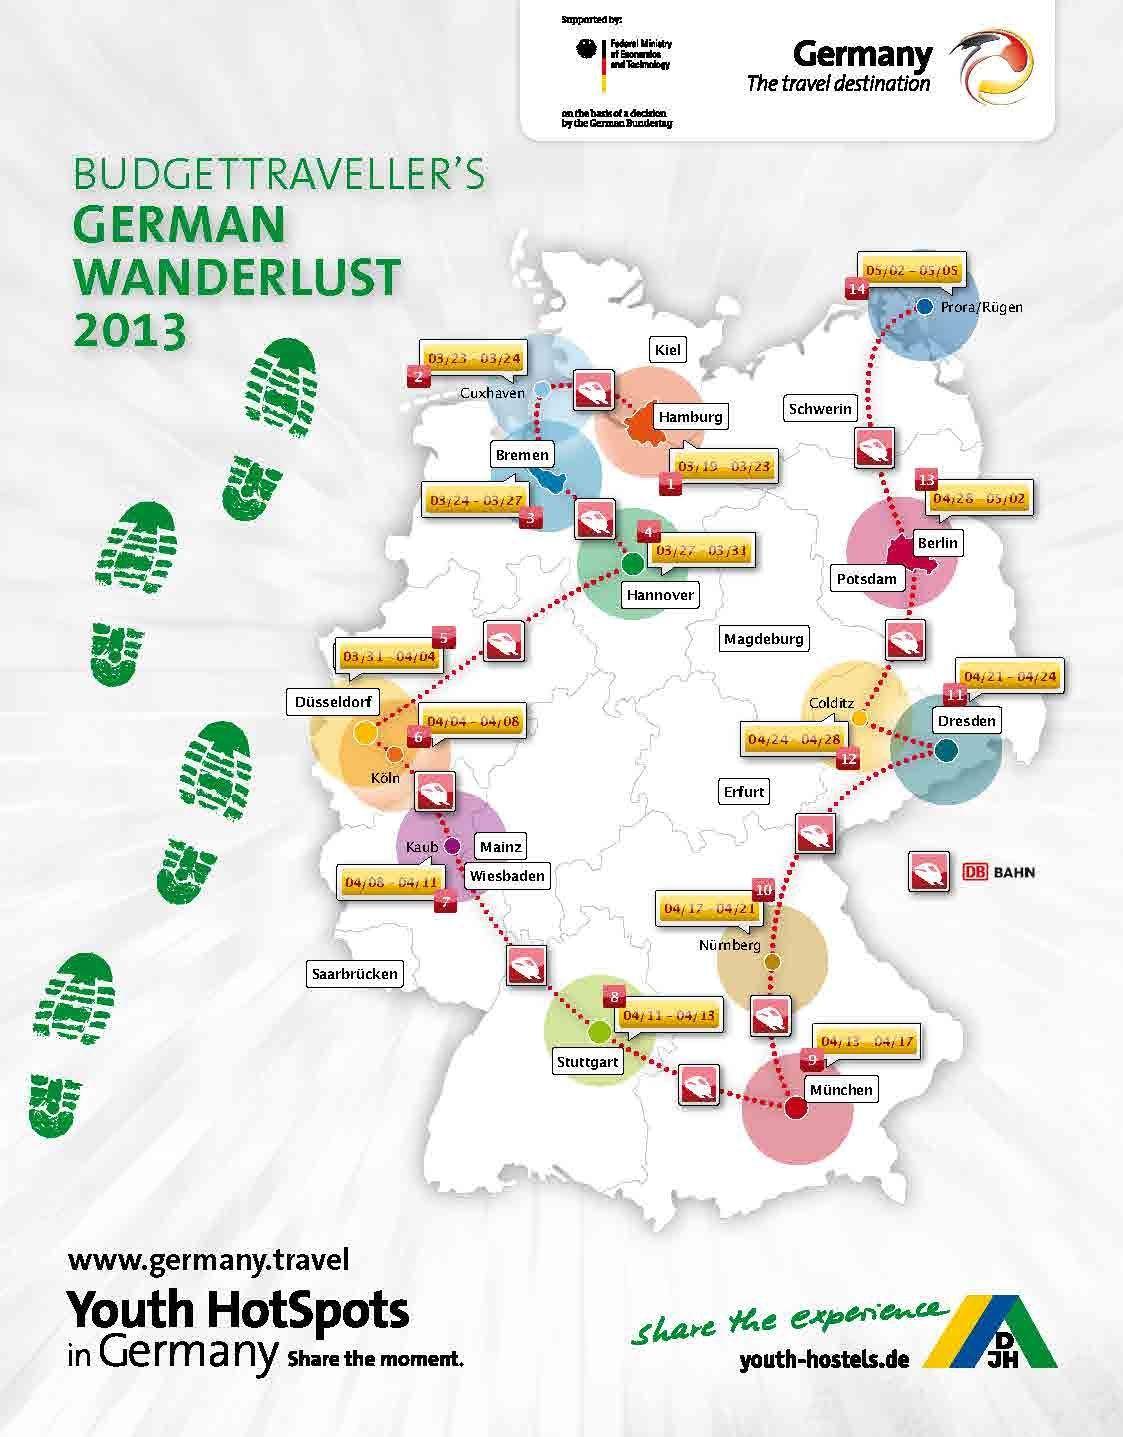 Blogger map German Wanderlust